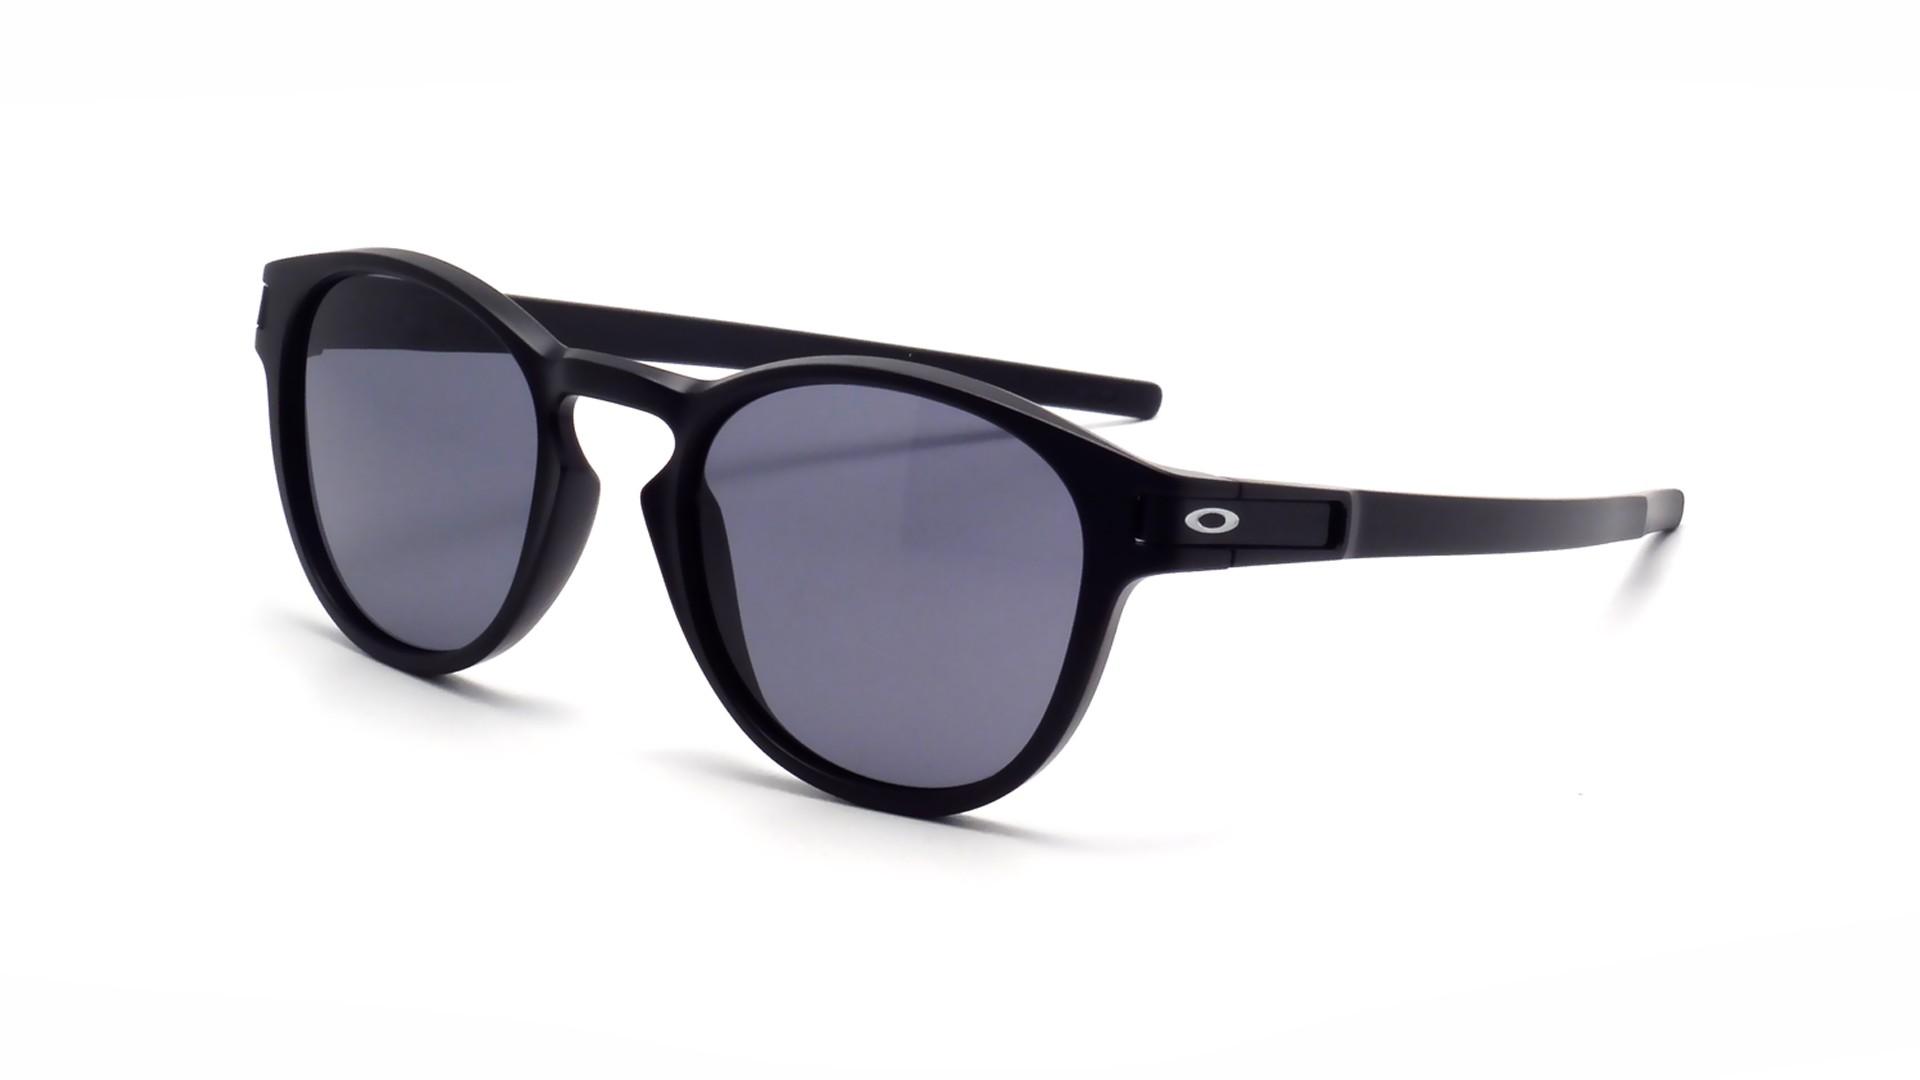 a79cffba379 Sunglasses Oakley Latch Black Matte OO9265 01 53-21 Medium